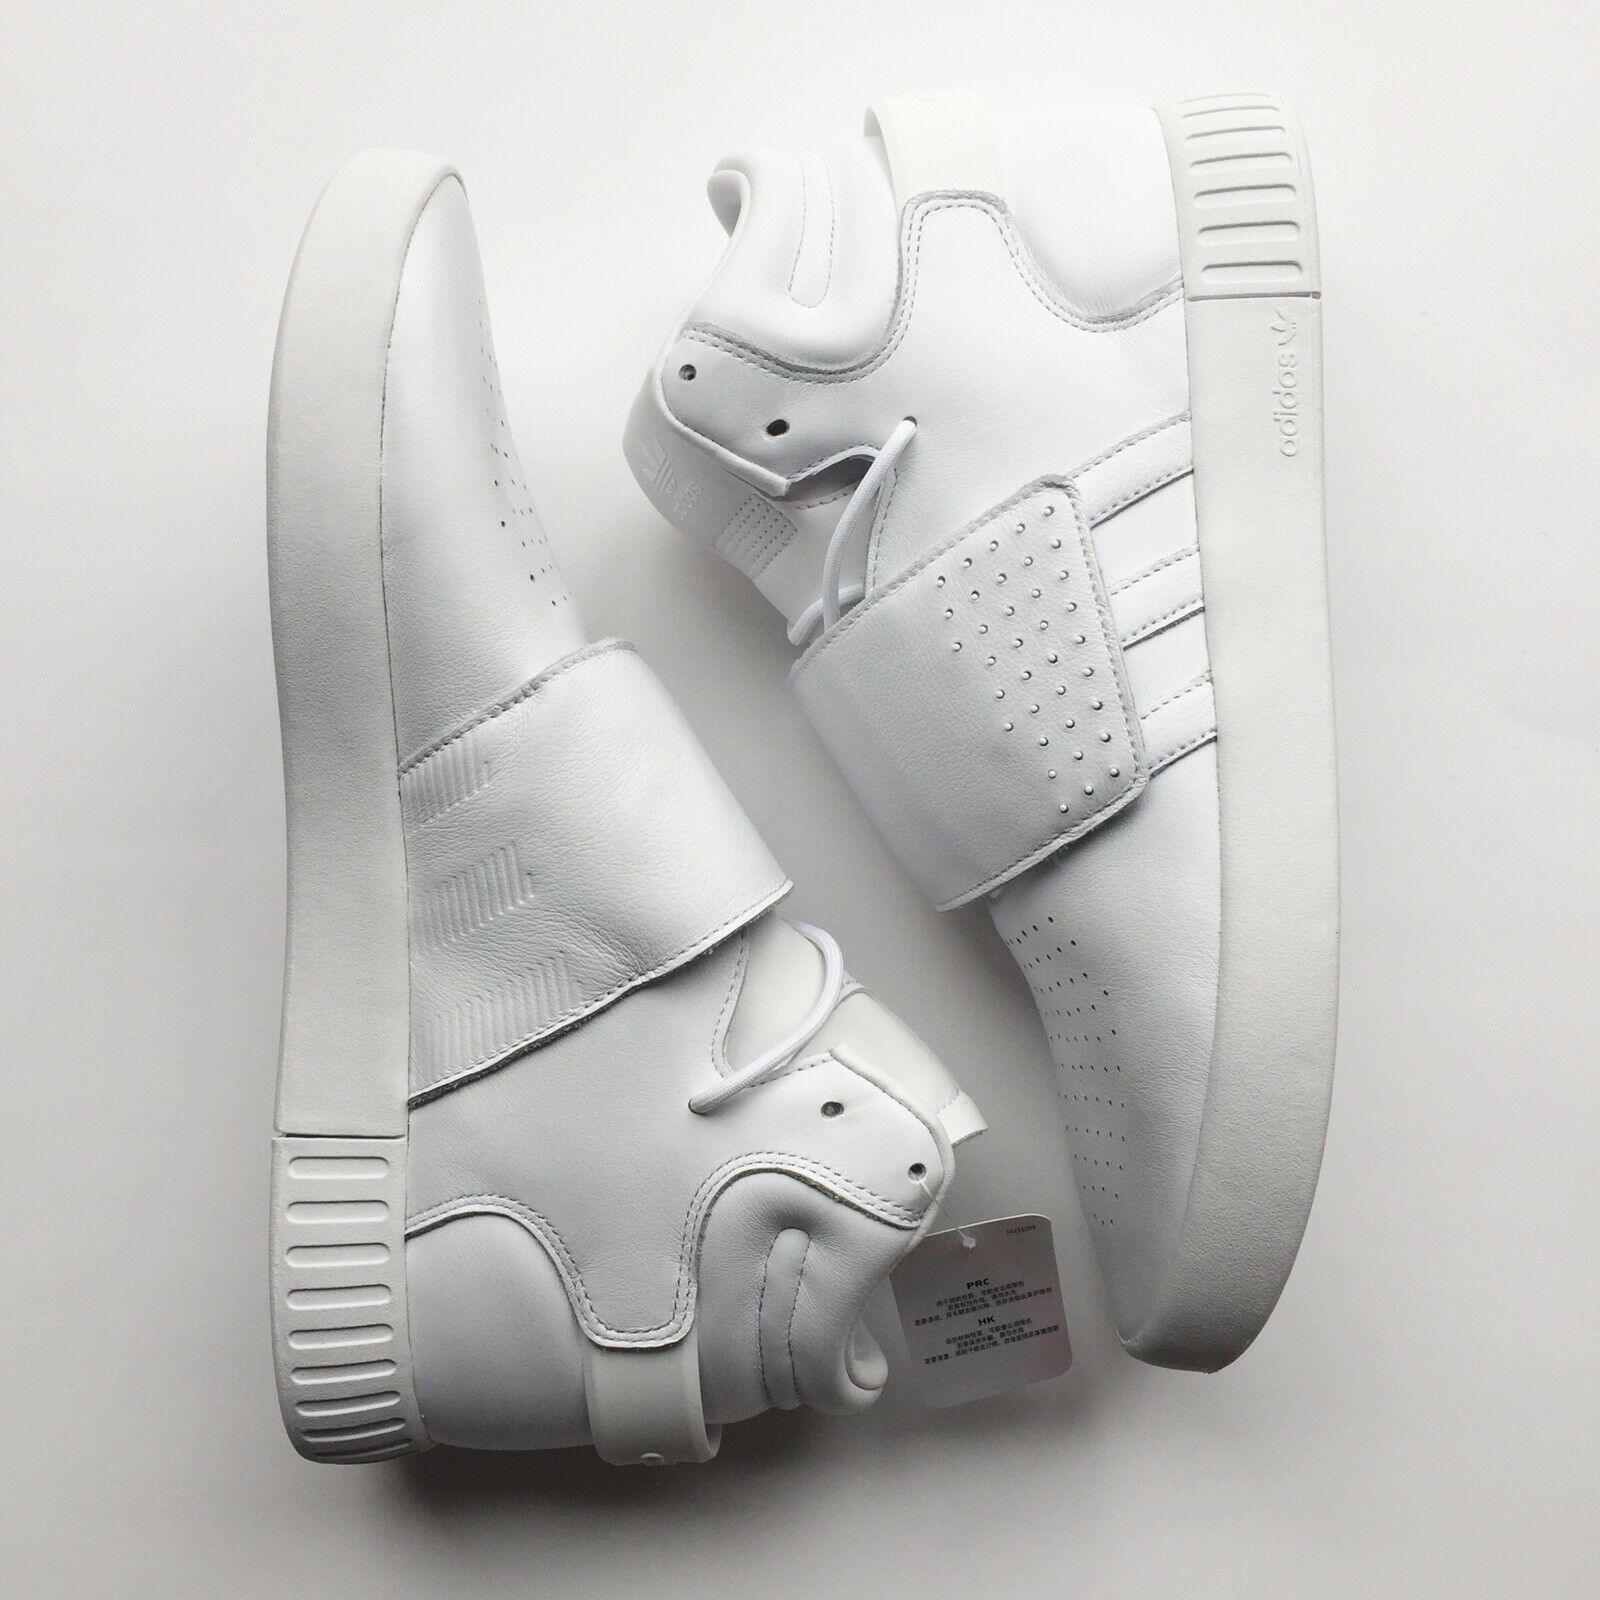 Men's Adidas Tubular Invader Strap New White Leather shoes US Size 11.5 BW0872